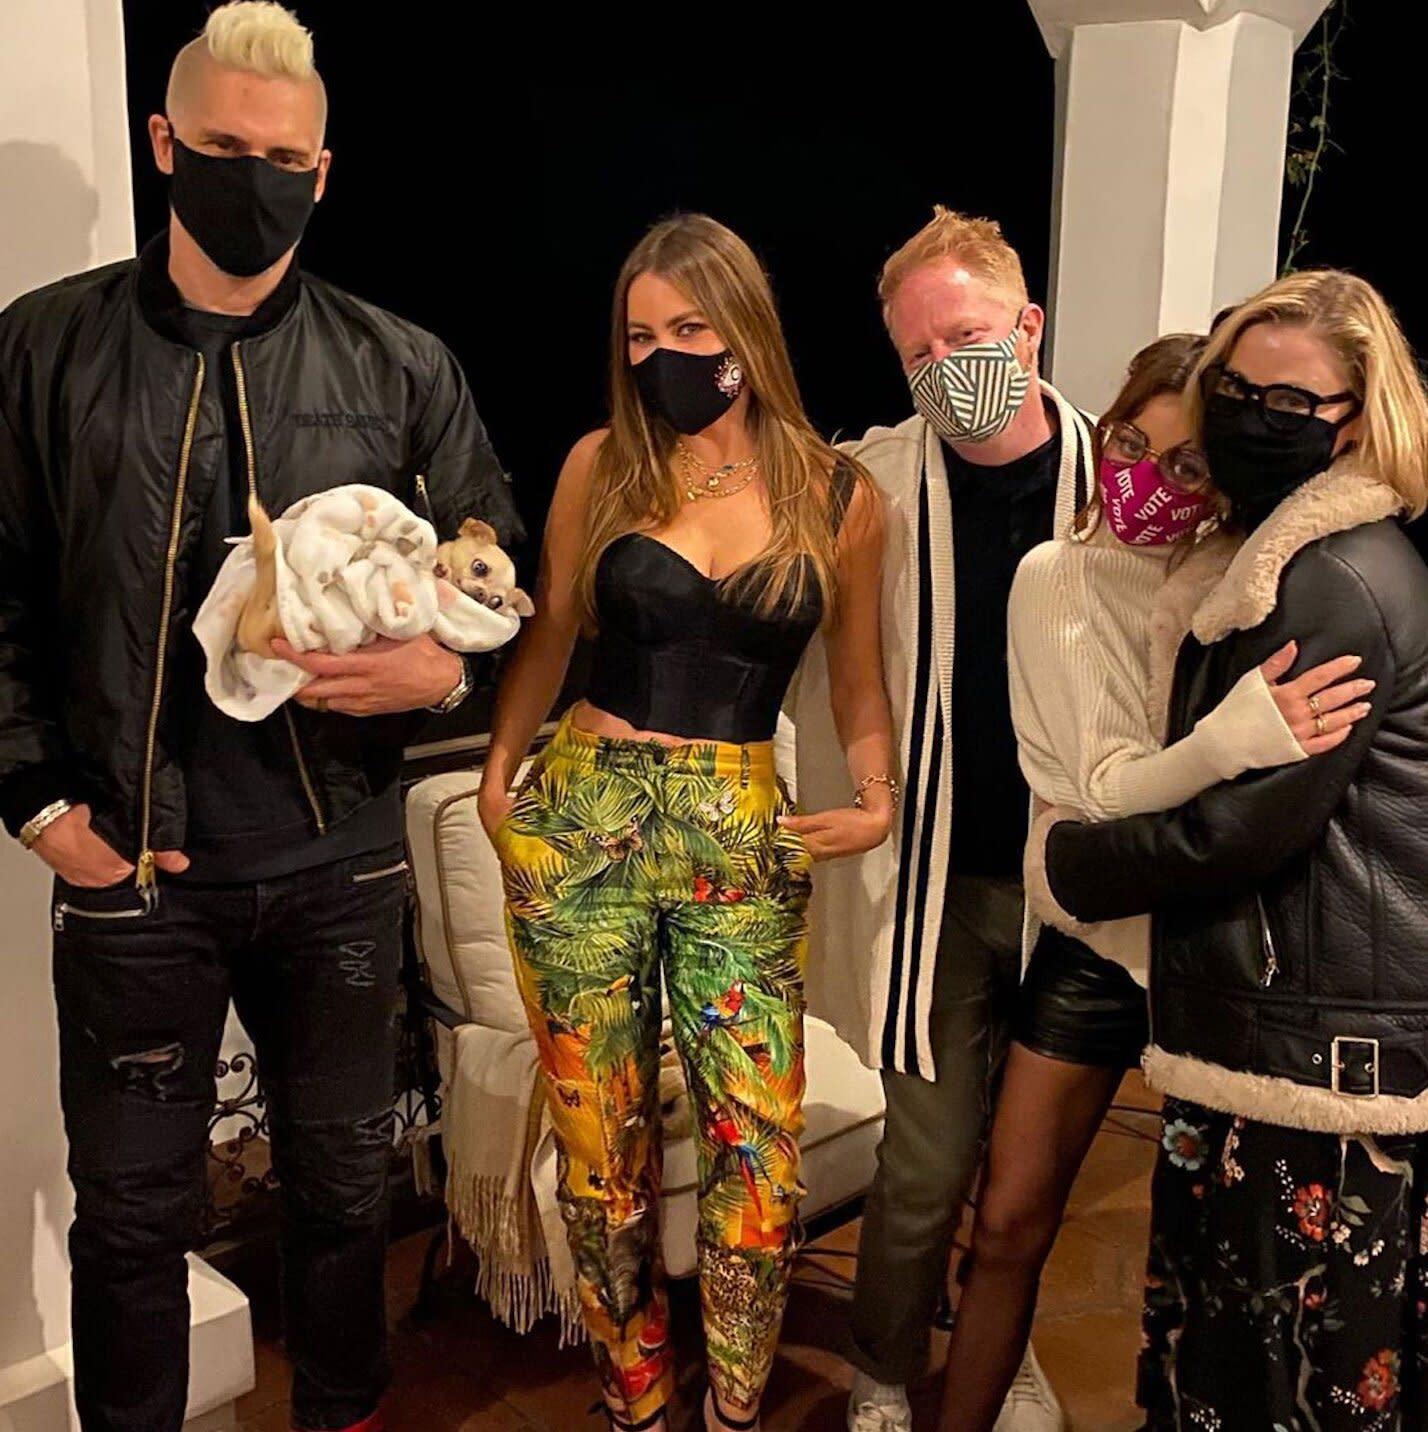 Sofia Vergara Sarah Hyland And More Gather For Mini Modern Family Reunion So Much Fun